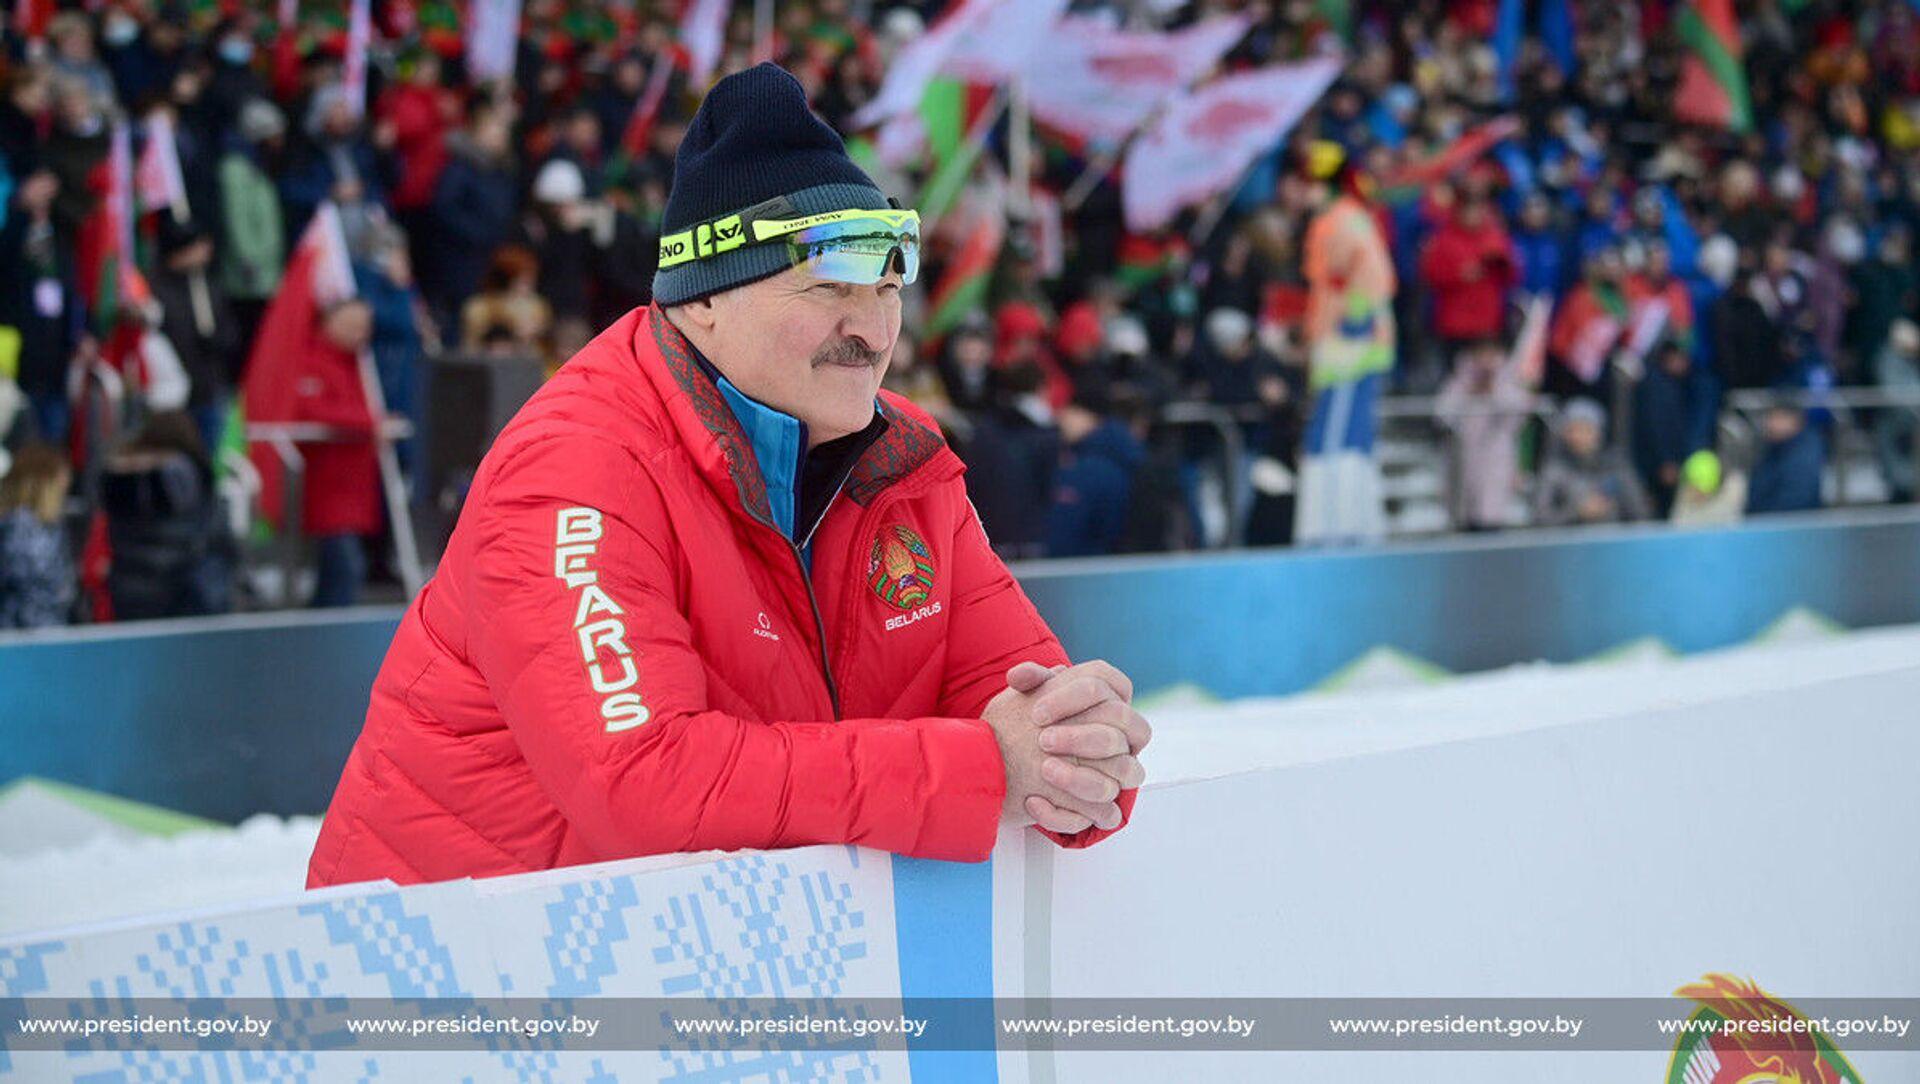 Президент Беларуси Александр Лукашенко - Sputnik Беларусь, 1920, 13.03.2021